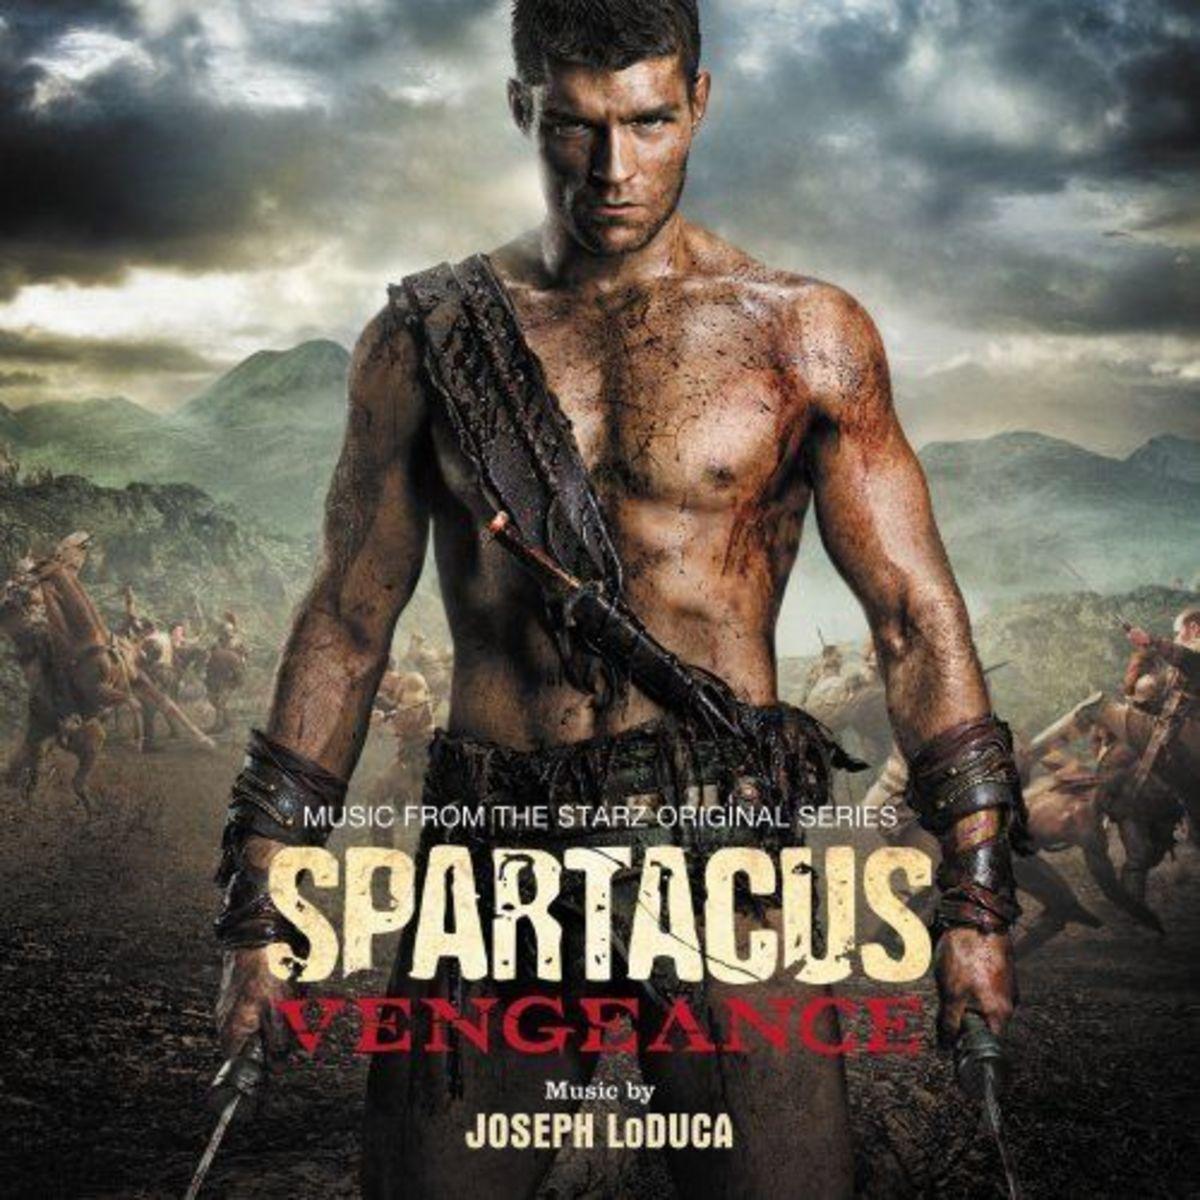 Spartacus   11 Best Historical TV Shows Like Vikings